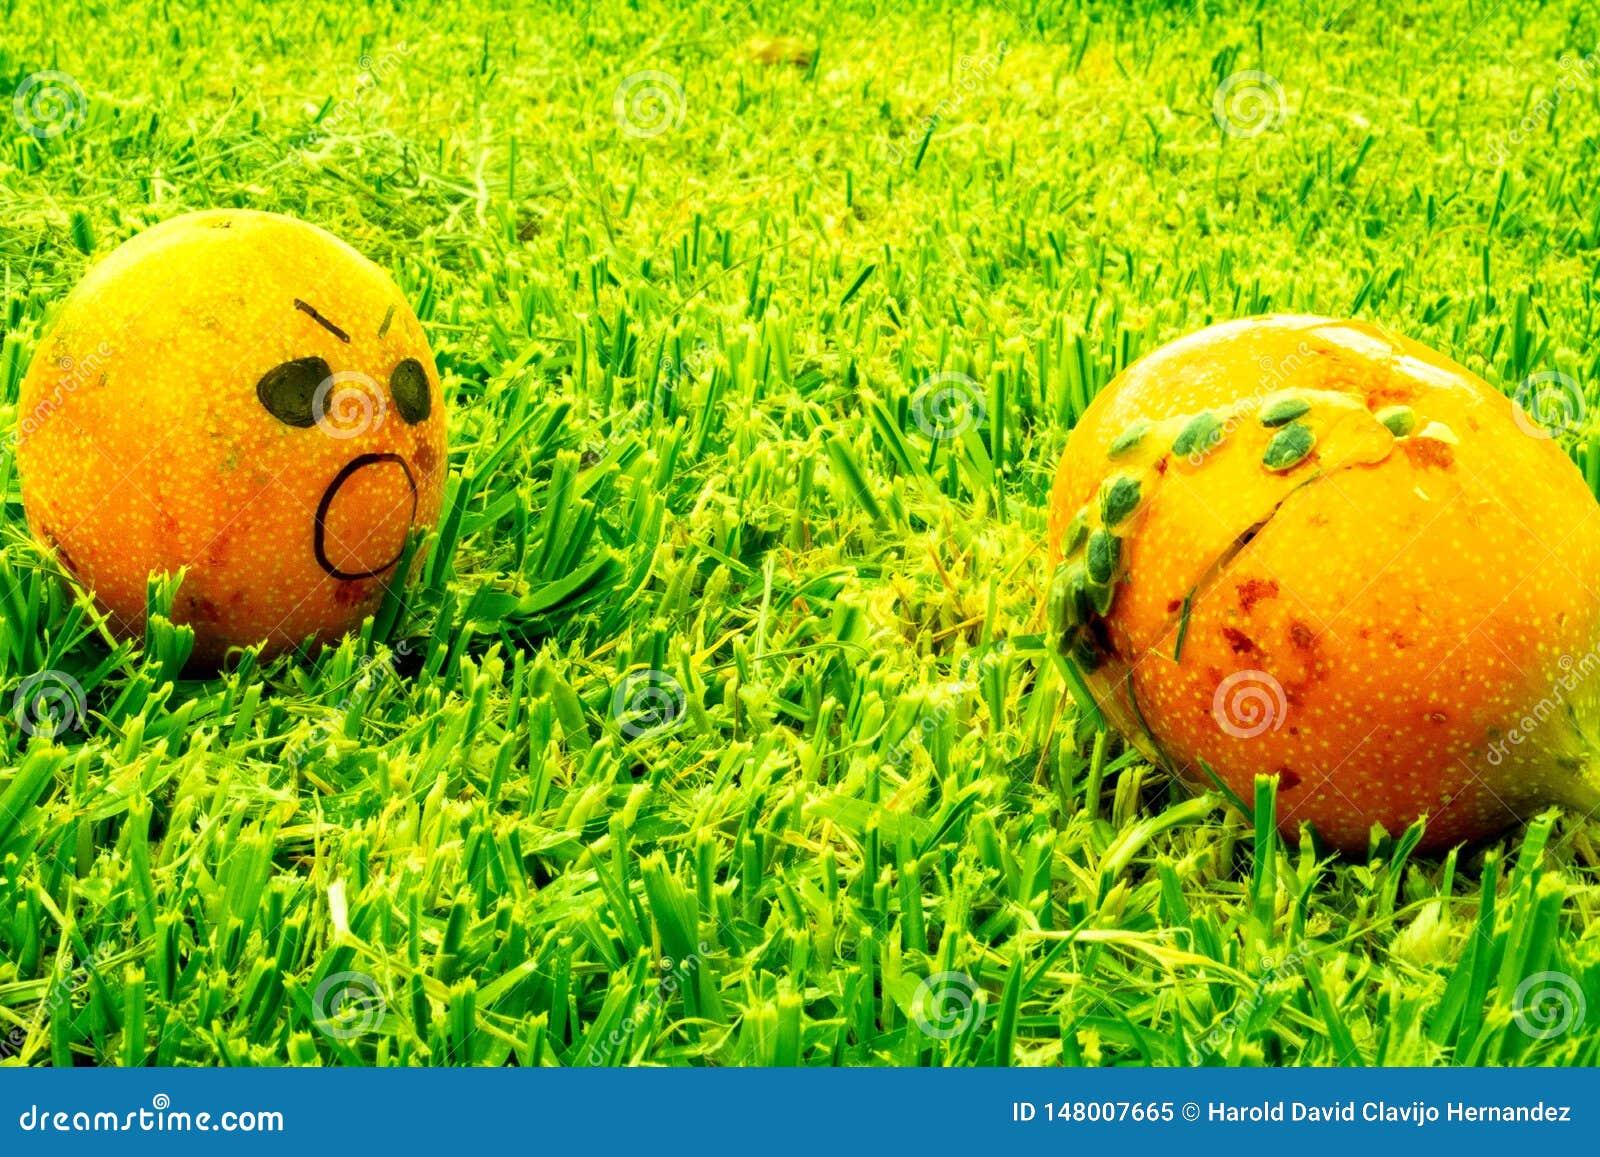 Terreur de fruit nourriture gaspillée